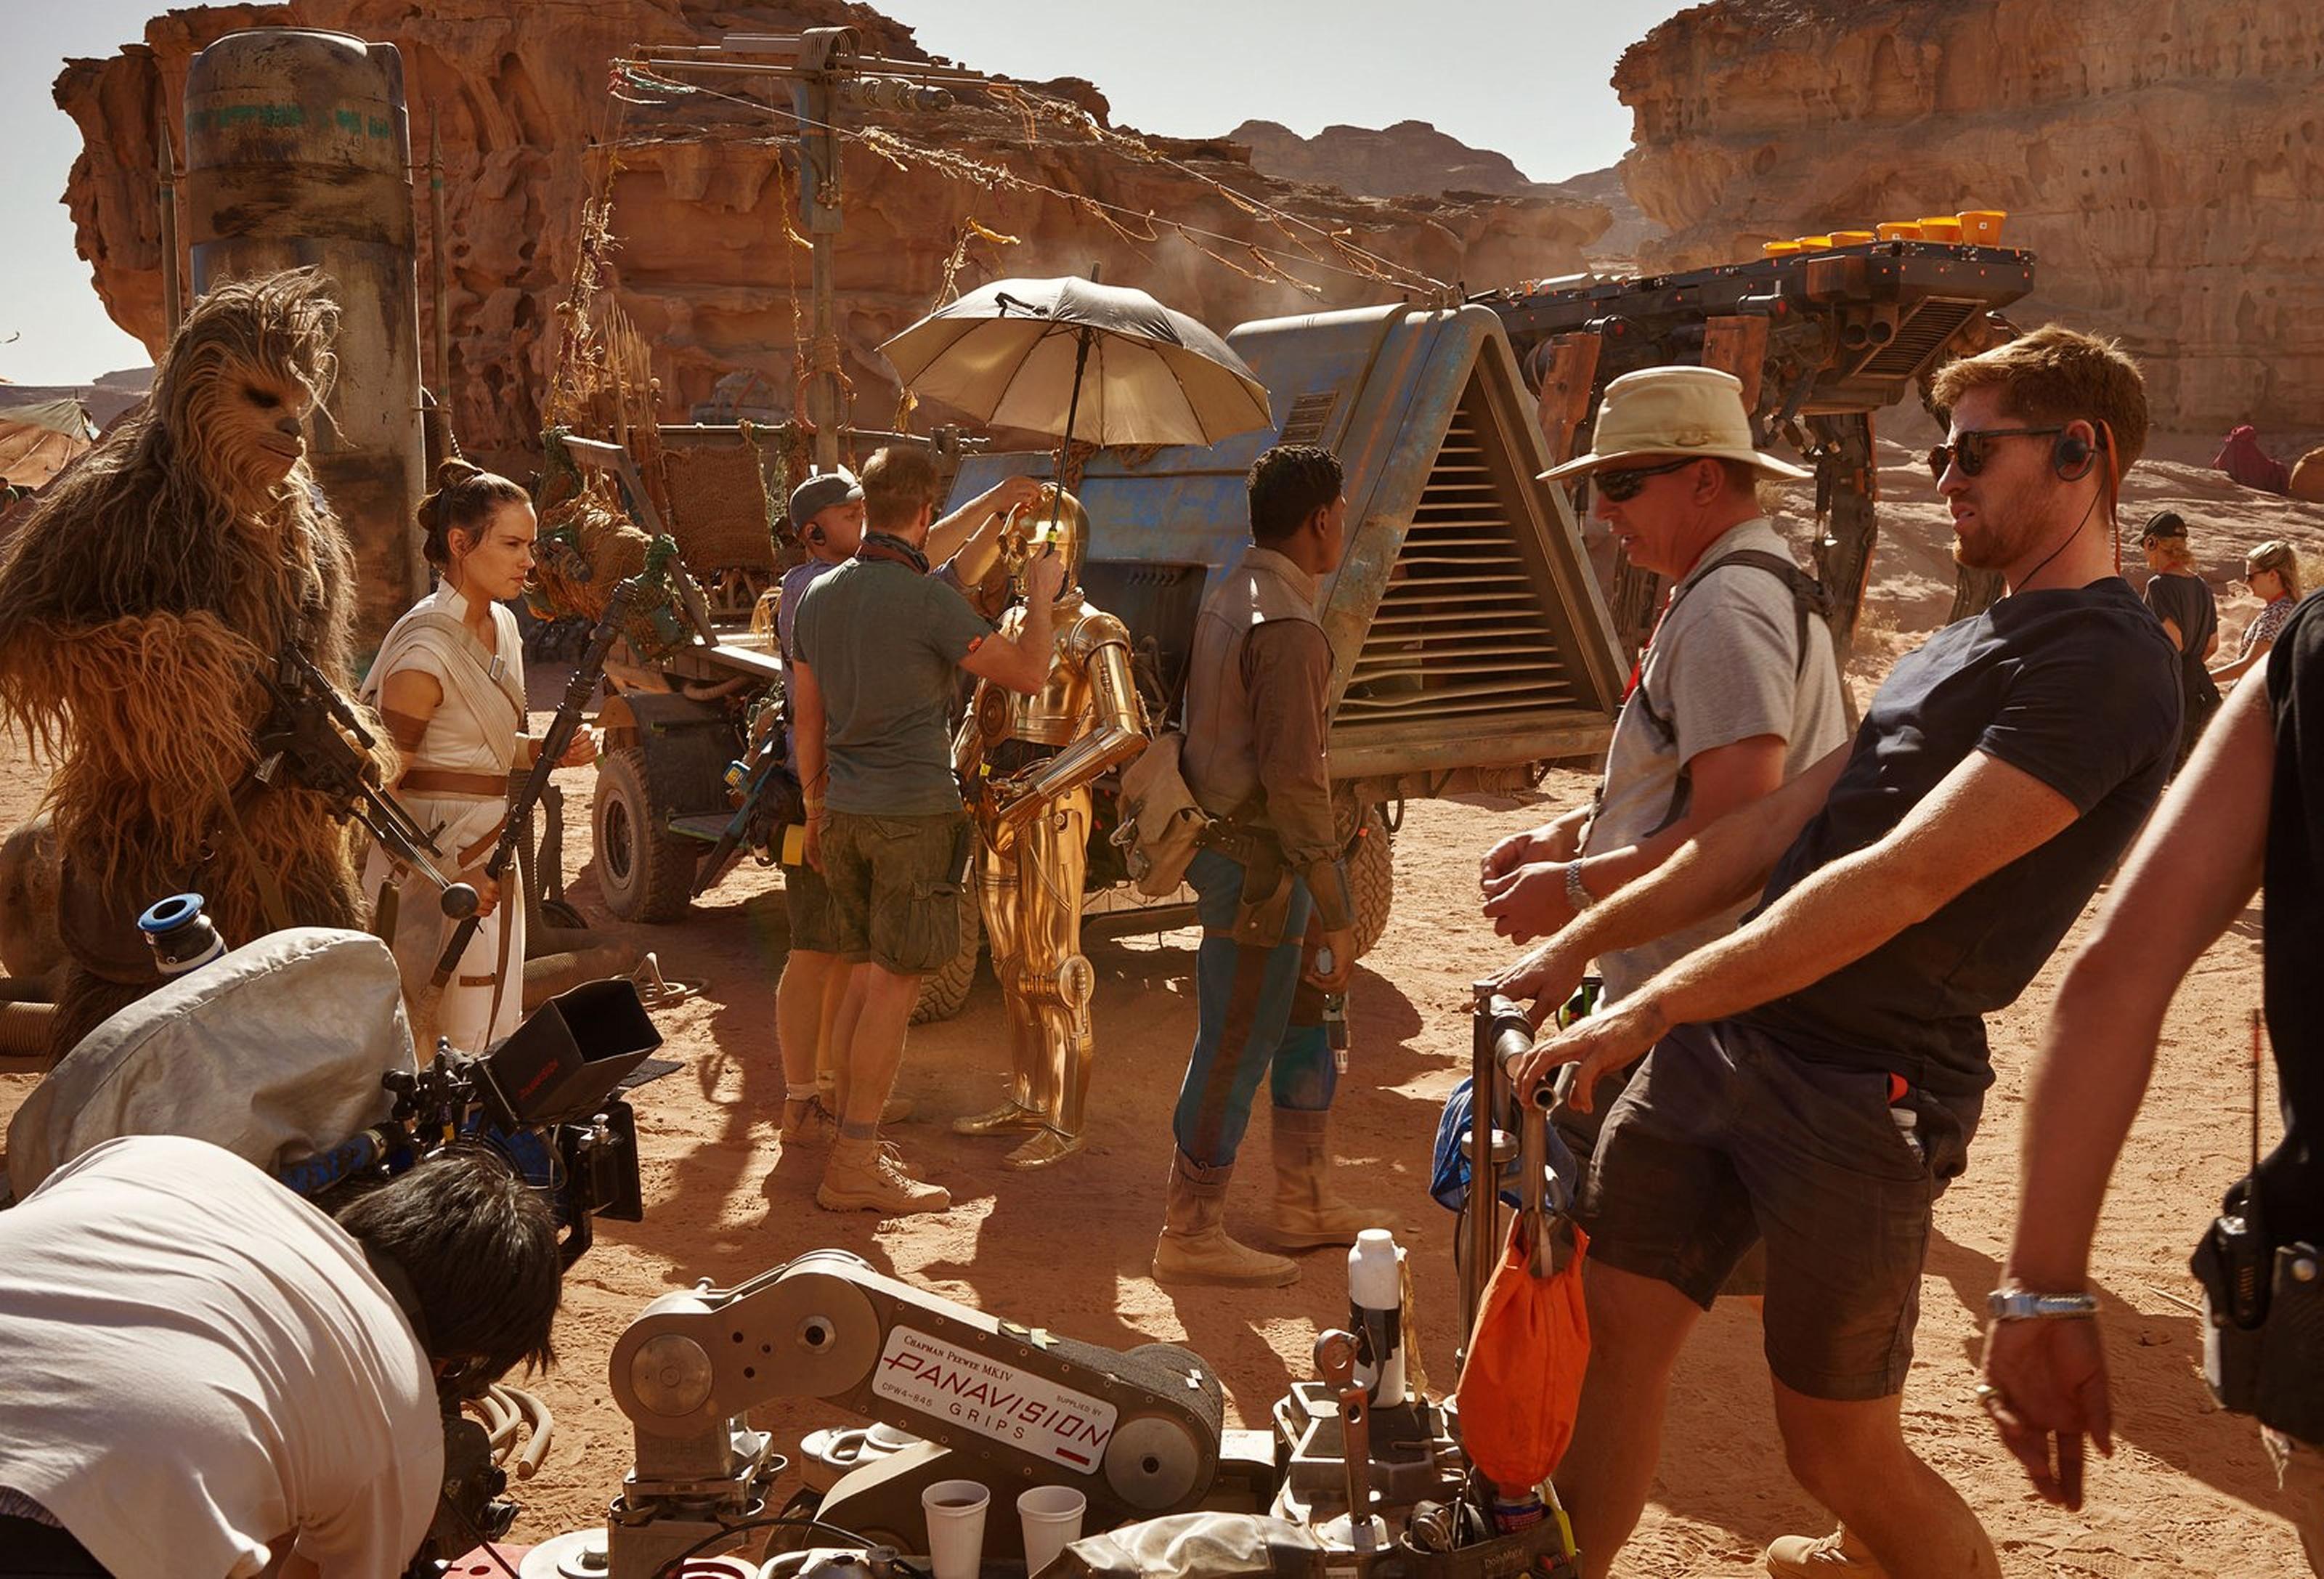 star-wars-the-rise-of-skywalker-vanity-fair-rebels-on-the-planet-pasaana-exclusive-hi-resolution-image-by-annie-leibovitz.jpg